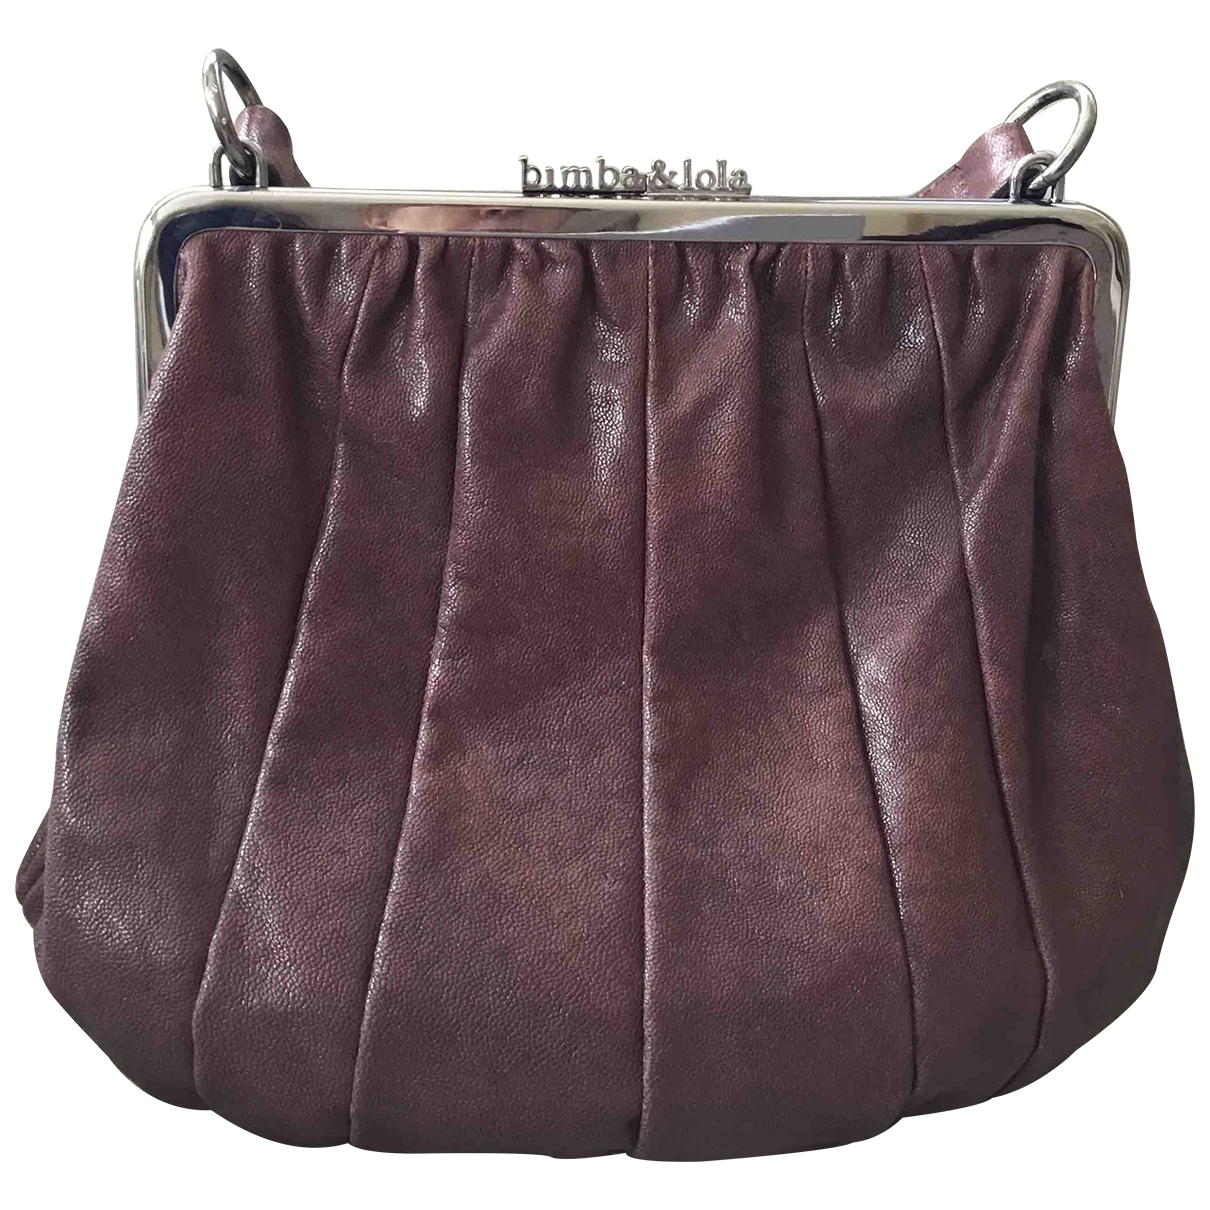 Bimba Y Lola \N Brown Leather handbag for Women \N